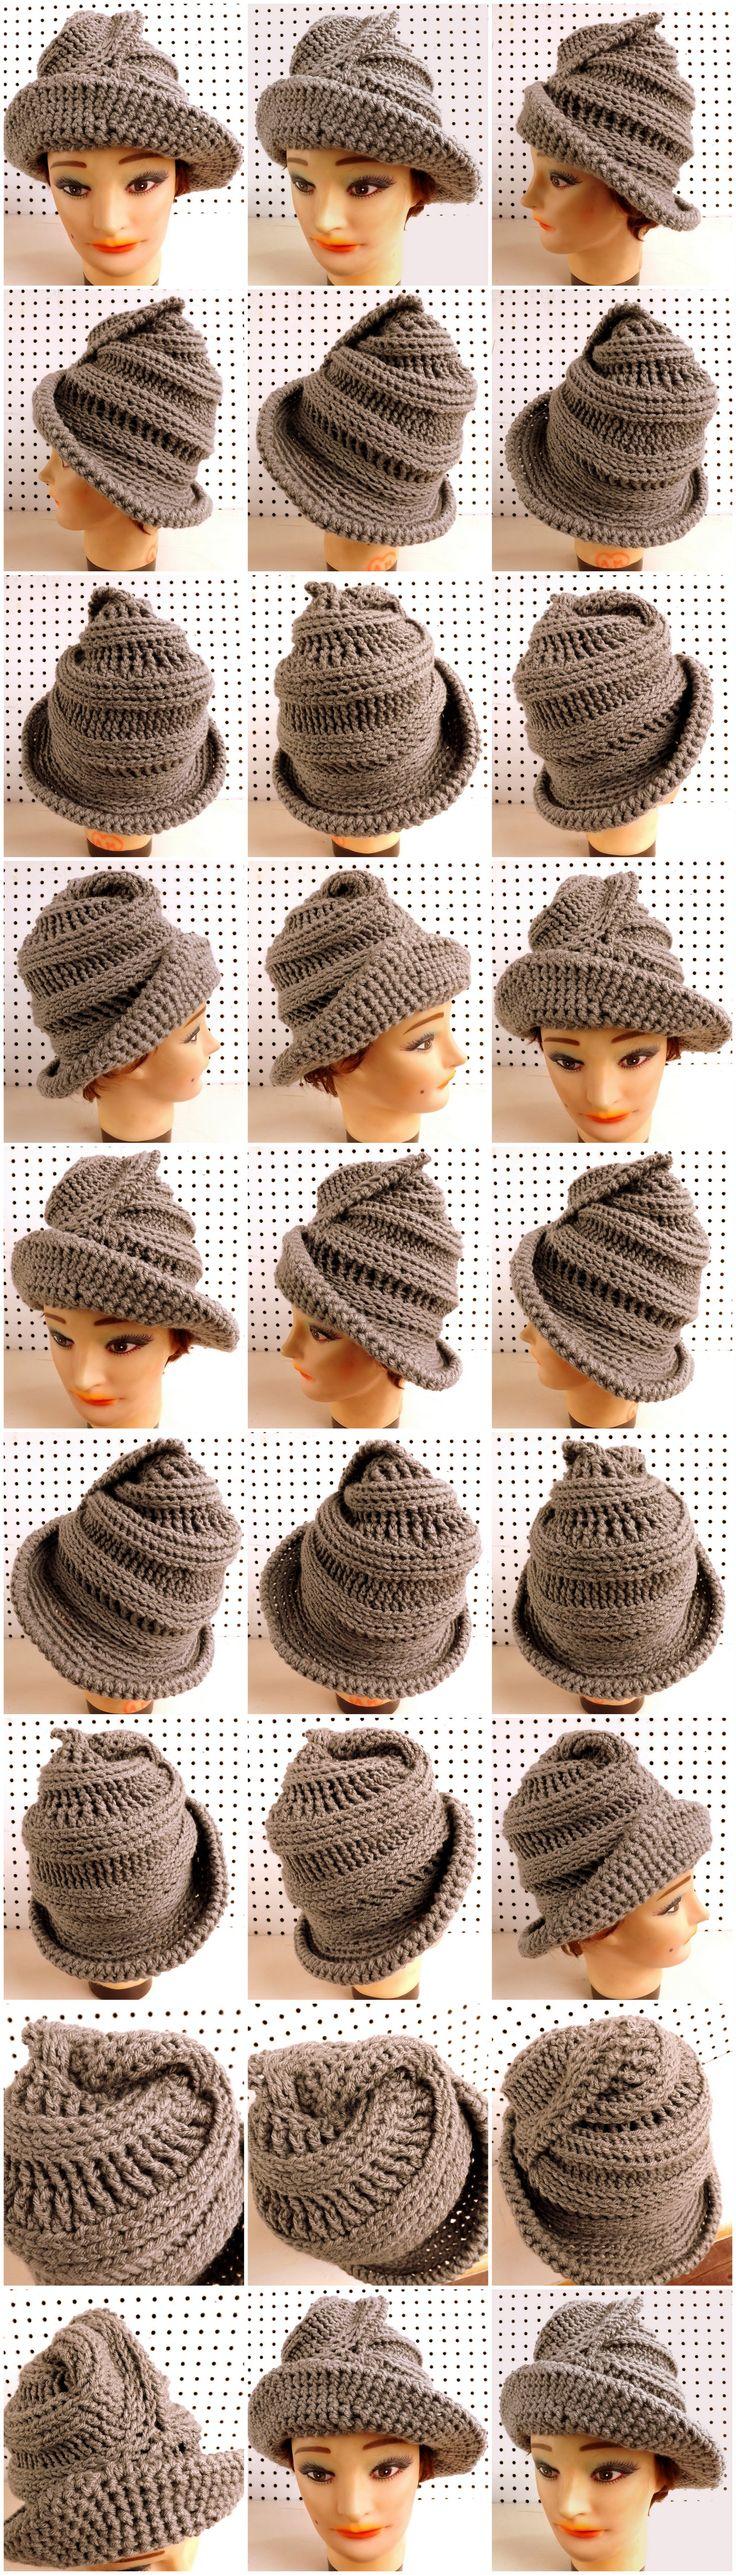 https://www.etsy.com/listing/173157370/unique-crochet-hats-for-women-virginia VIRGINIA Crochet Steampunk Wide Brim Hat in Gray